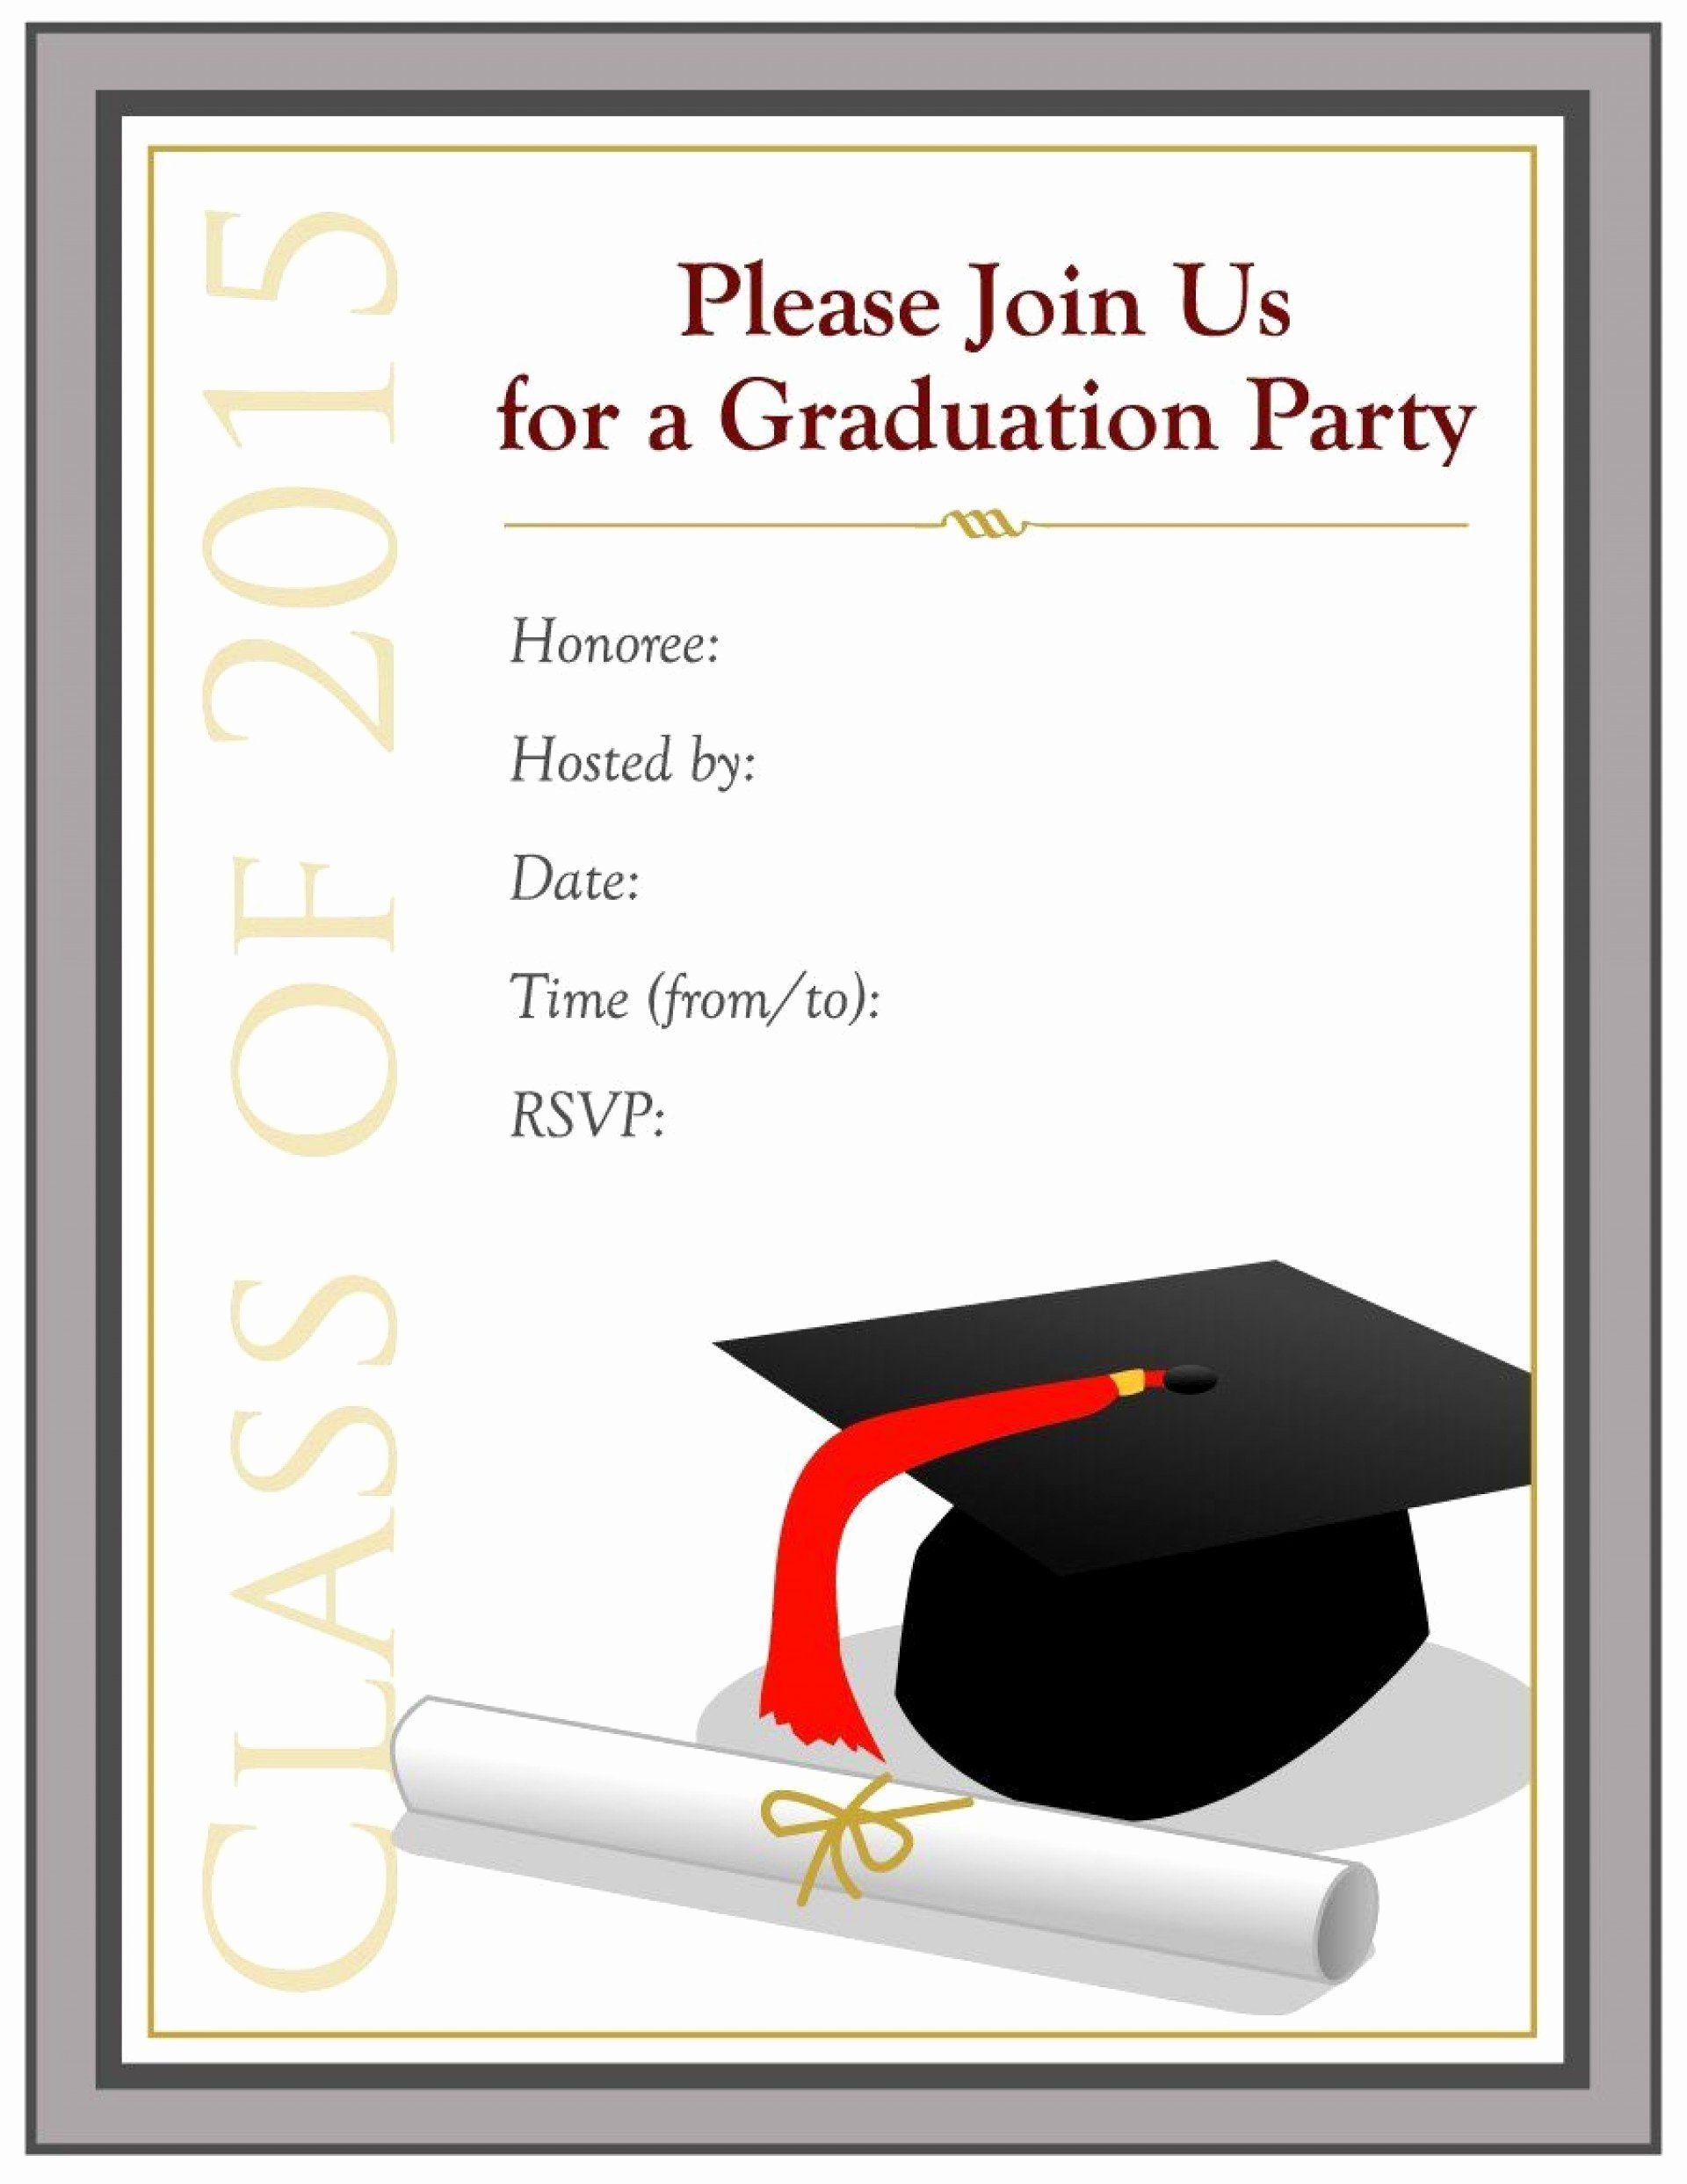 Online Graduation Cards Elegant 002 Graduation Part Graduation Invitations Template Graduation Party Invitations Templates College Graduation Party Invitations